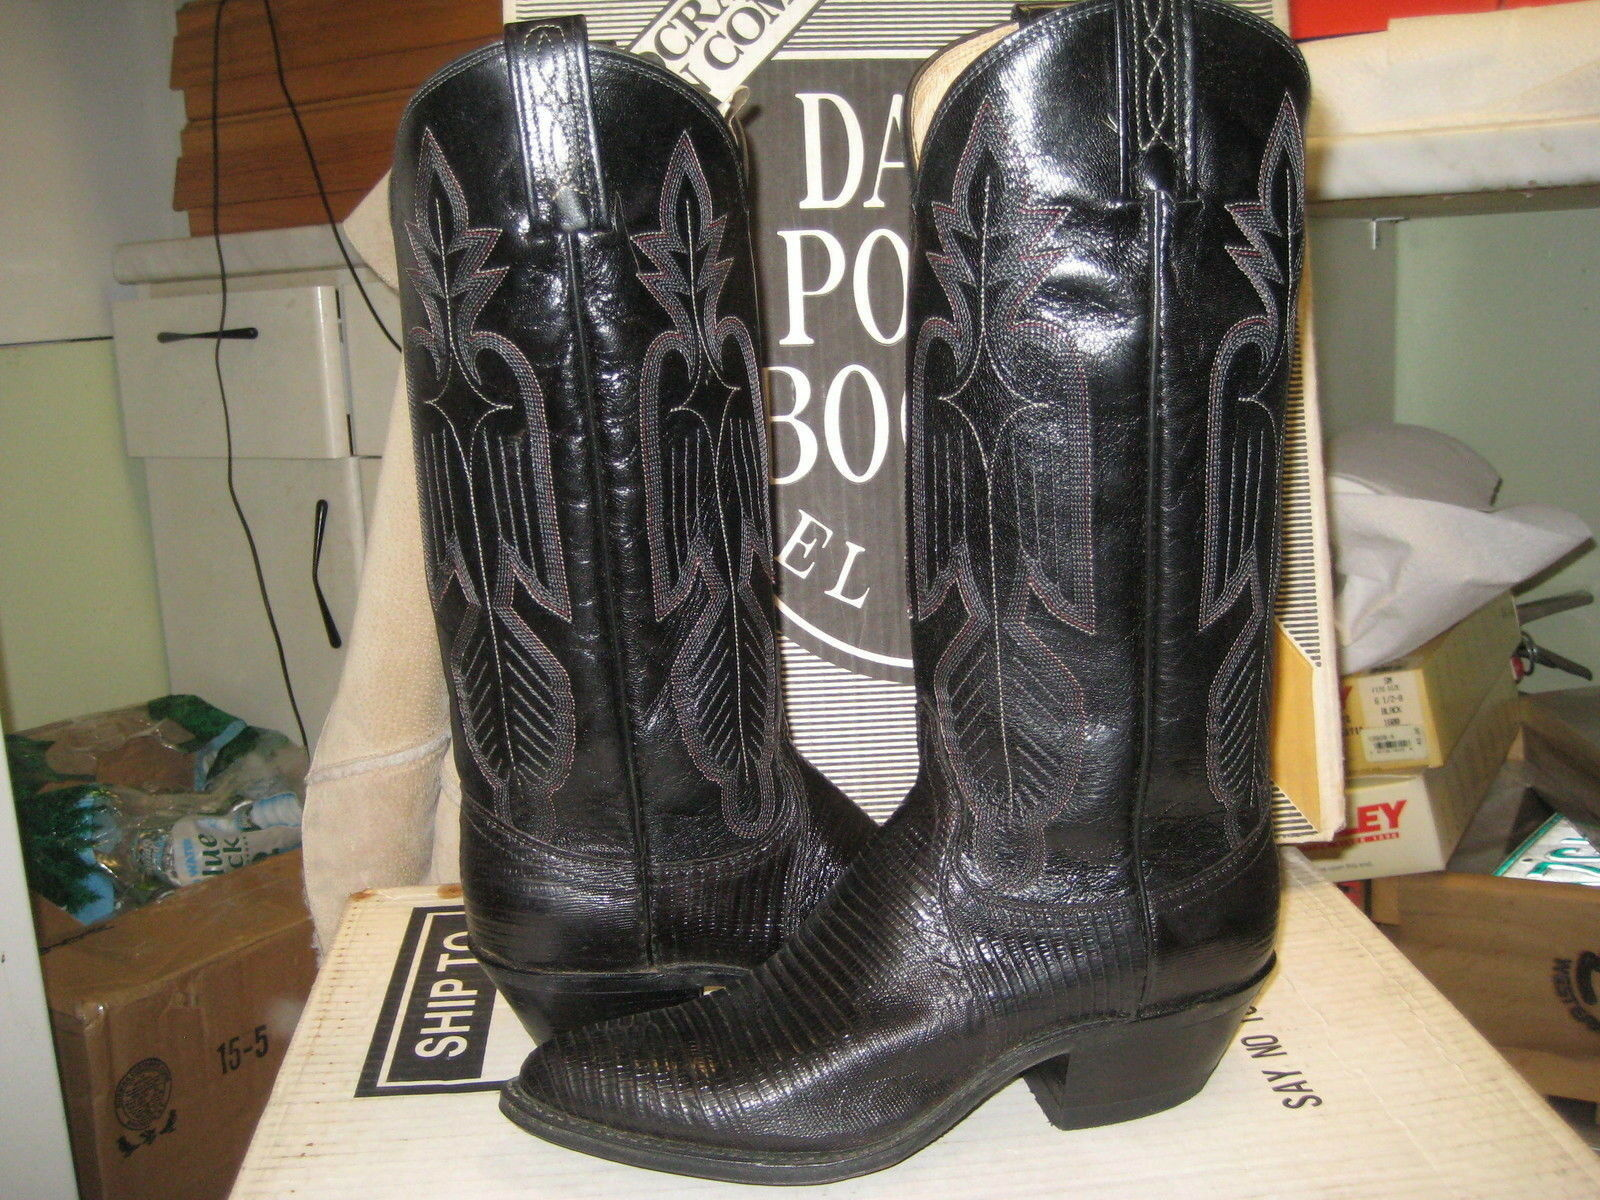 Dan Post para mujer botas botas botas occidental 4010 Negro Lagarto cuero 5.5 B Nuevo a5956e